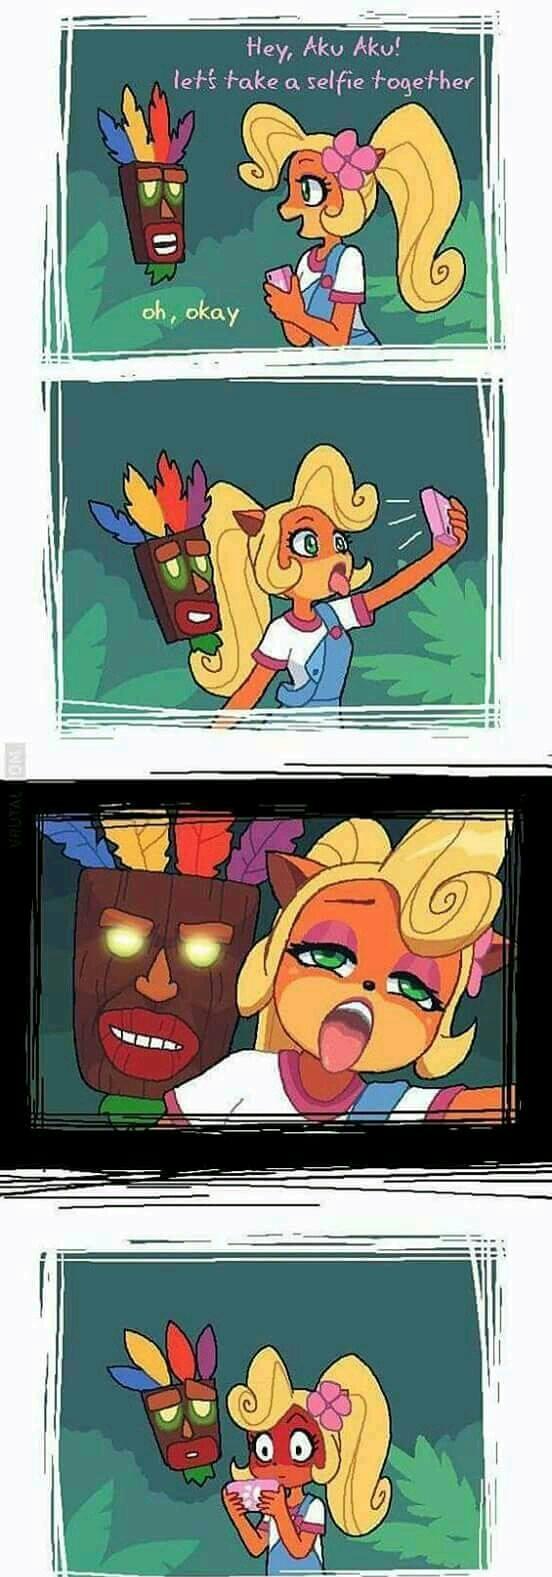 Crash bandicoot - Meme subido por ChristianMB :) Memedroid